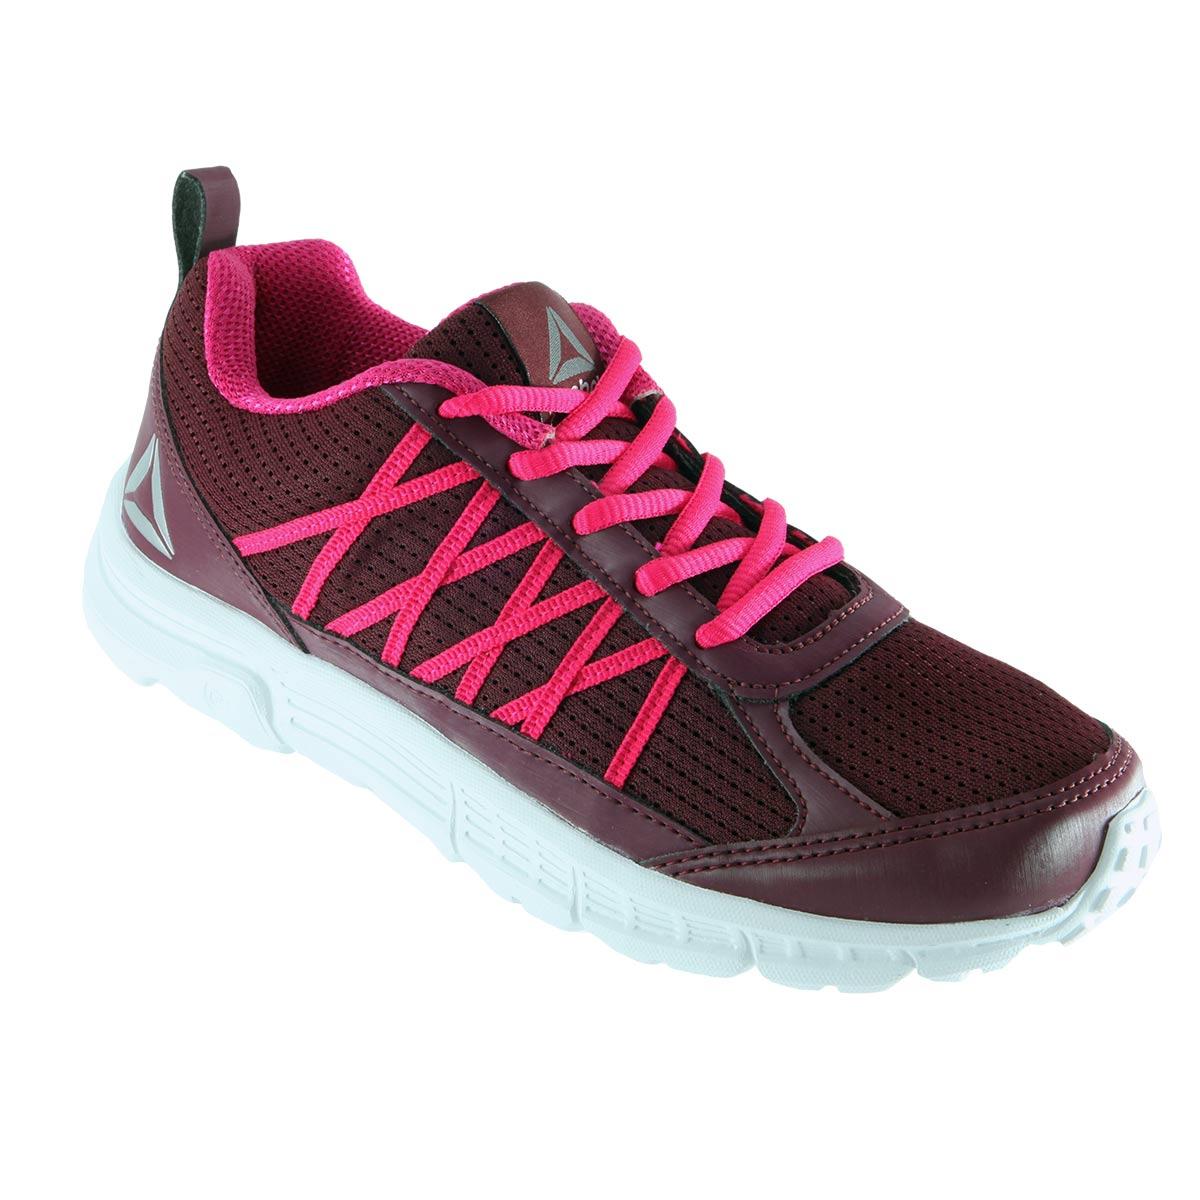 Tênis Reebok Speedlux 2.0 Feminino Corrida Caminhada BD5449